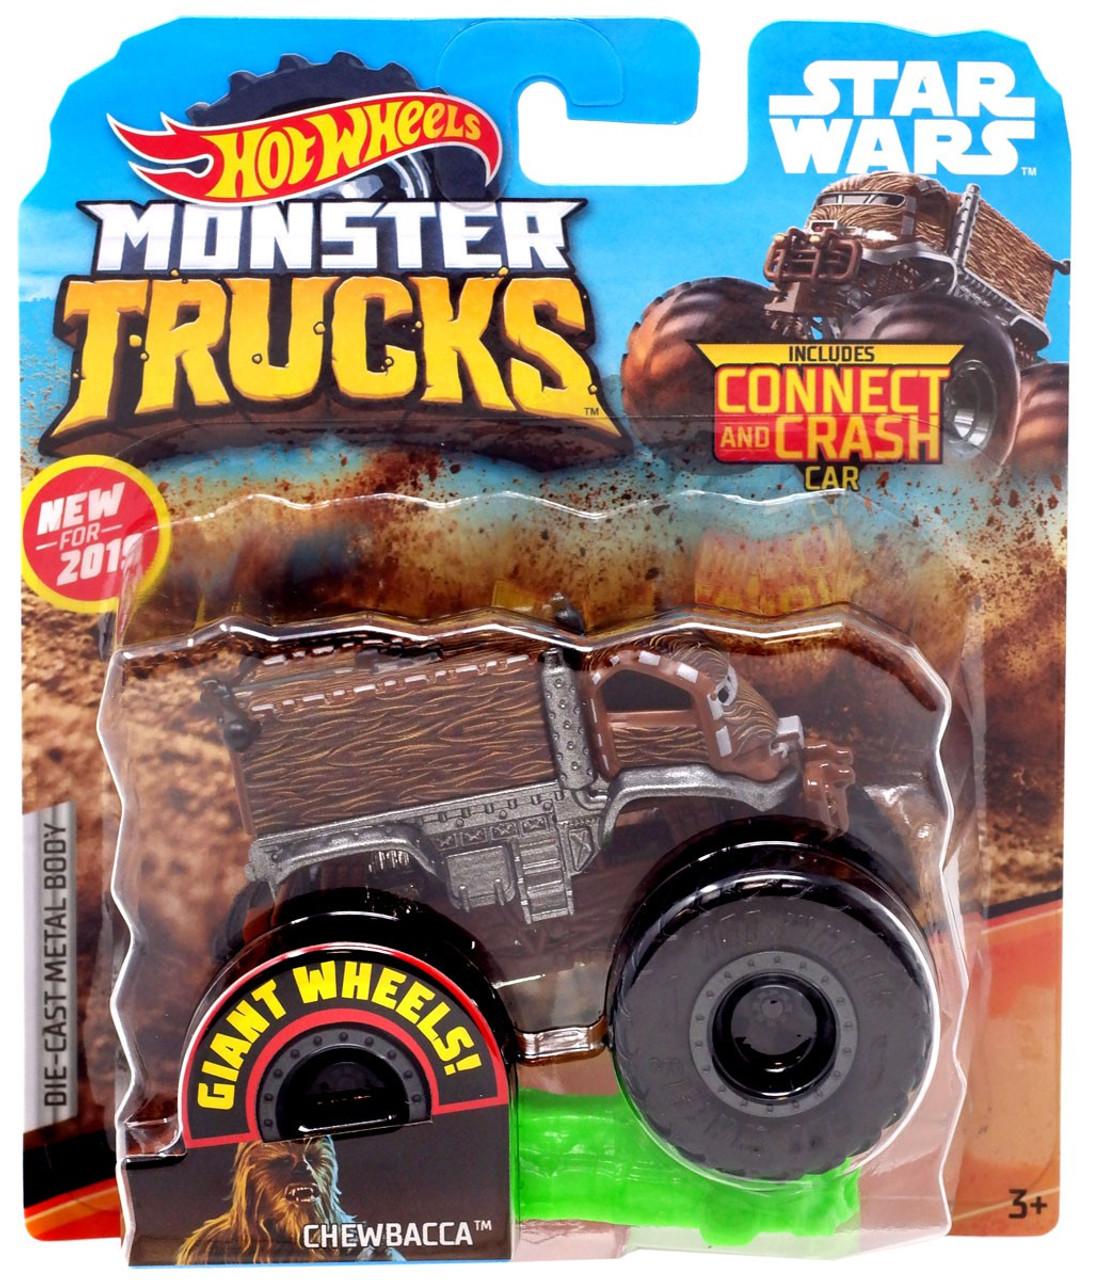 Star Wars Hot Wheels Chewbacca